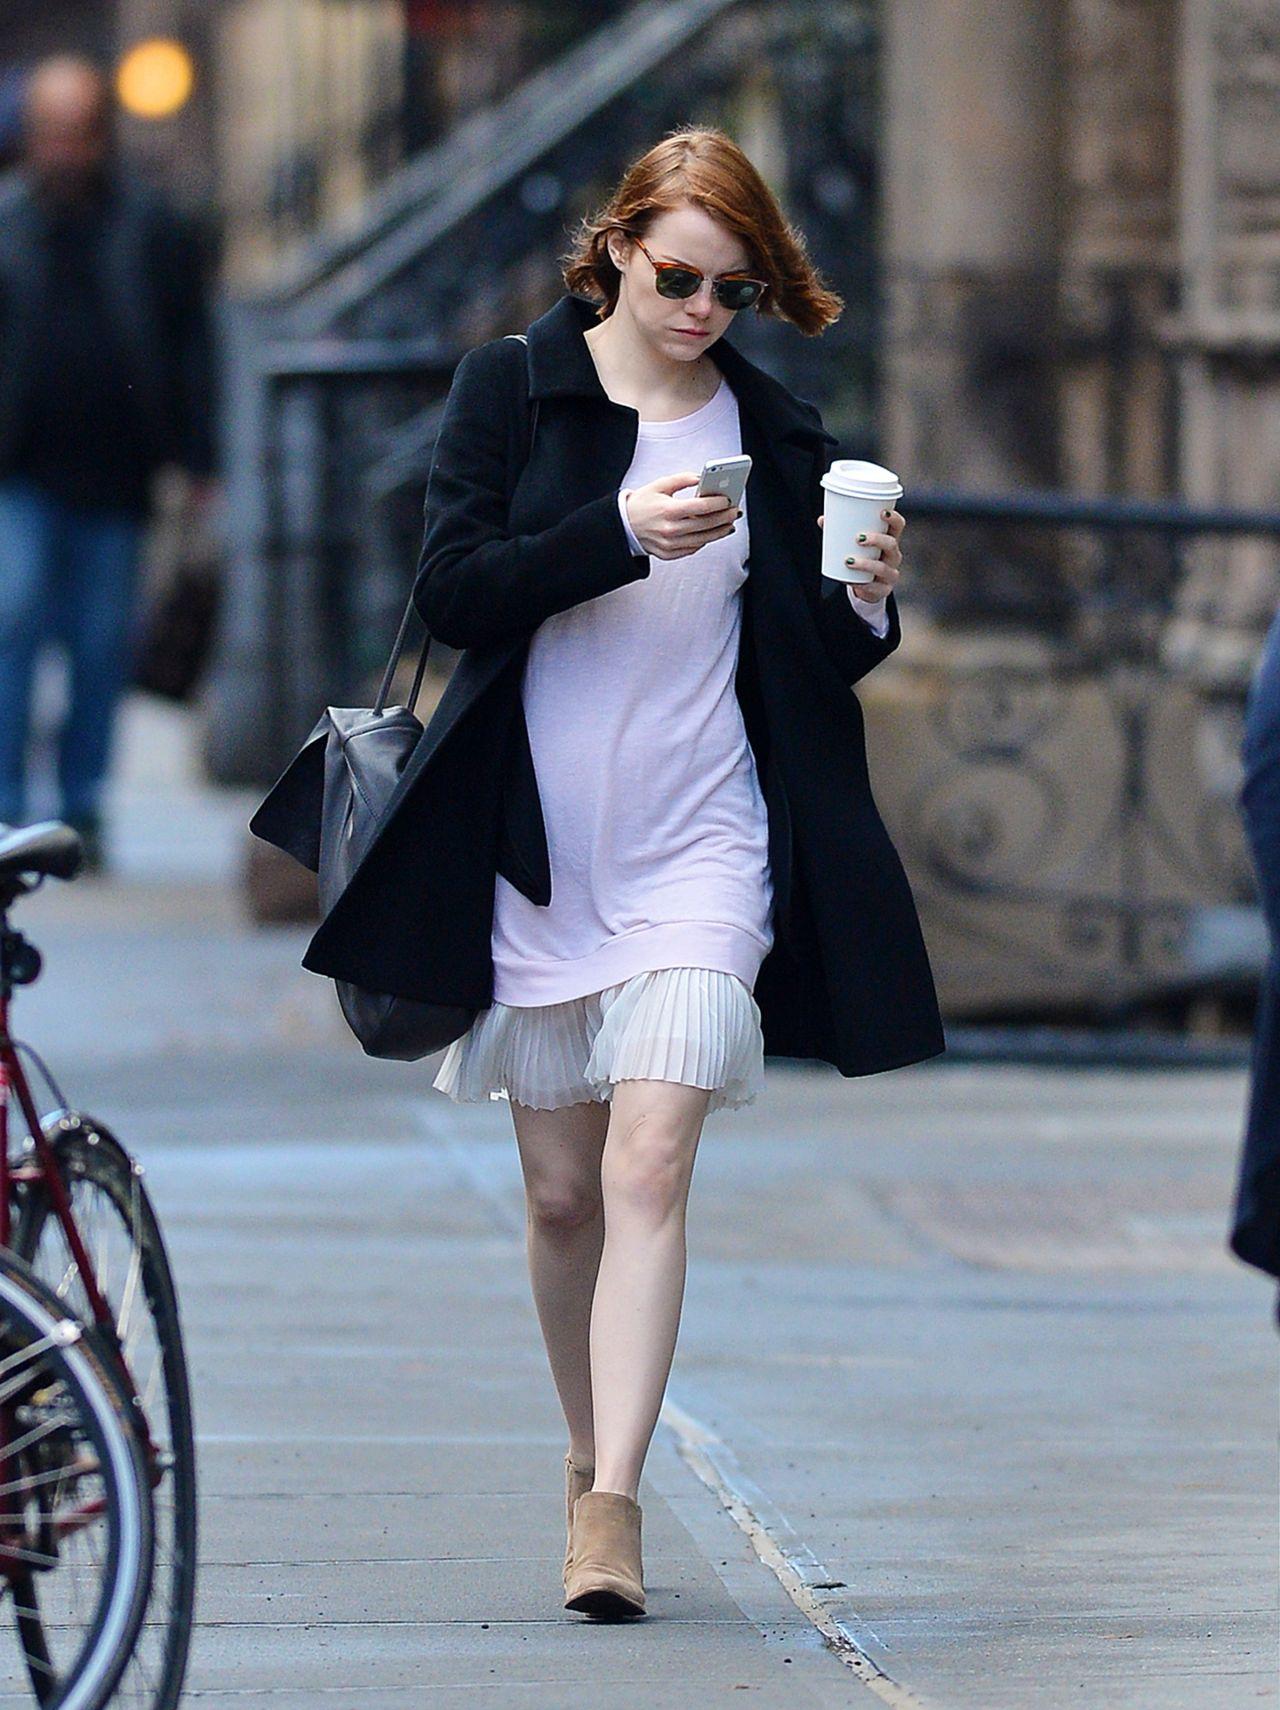 Emma Stone Leggy - Out in New York City - November 2014